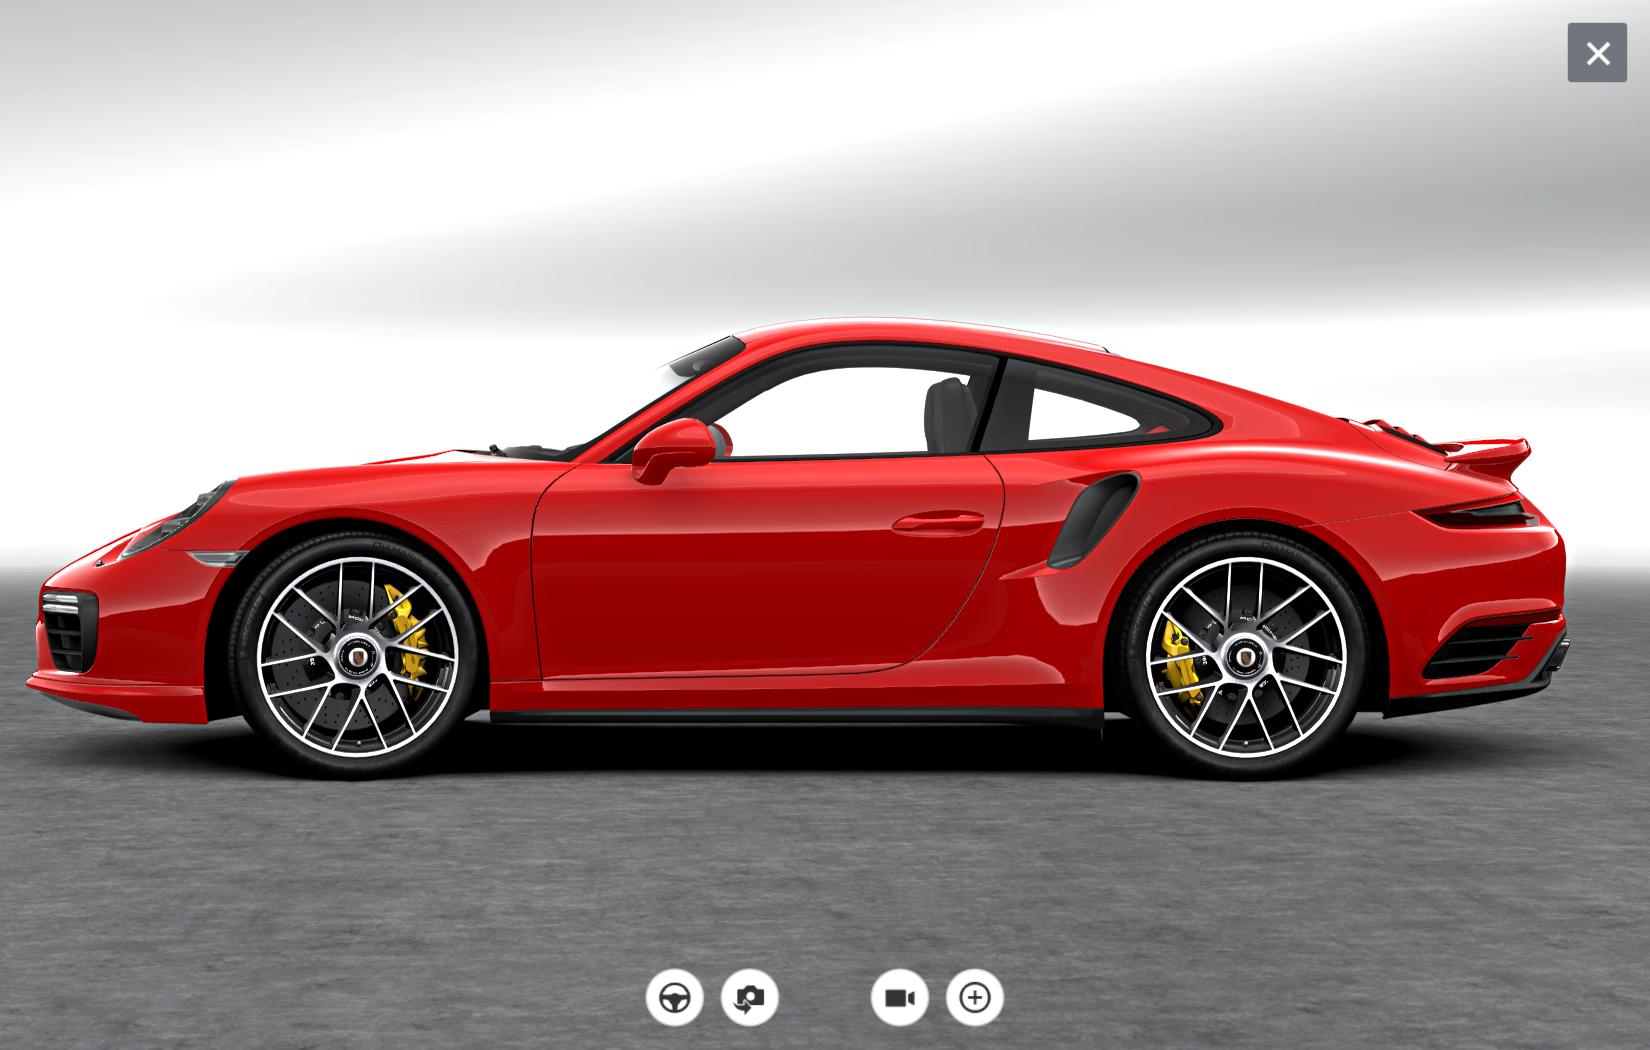 2018 Turbo S Configuration Help Rennlist Porsche Discussion Forums